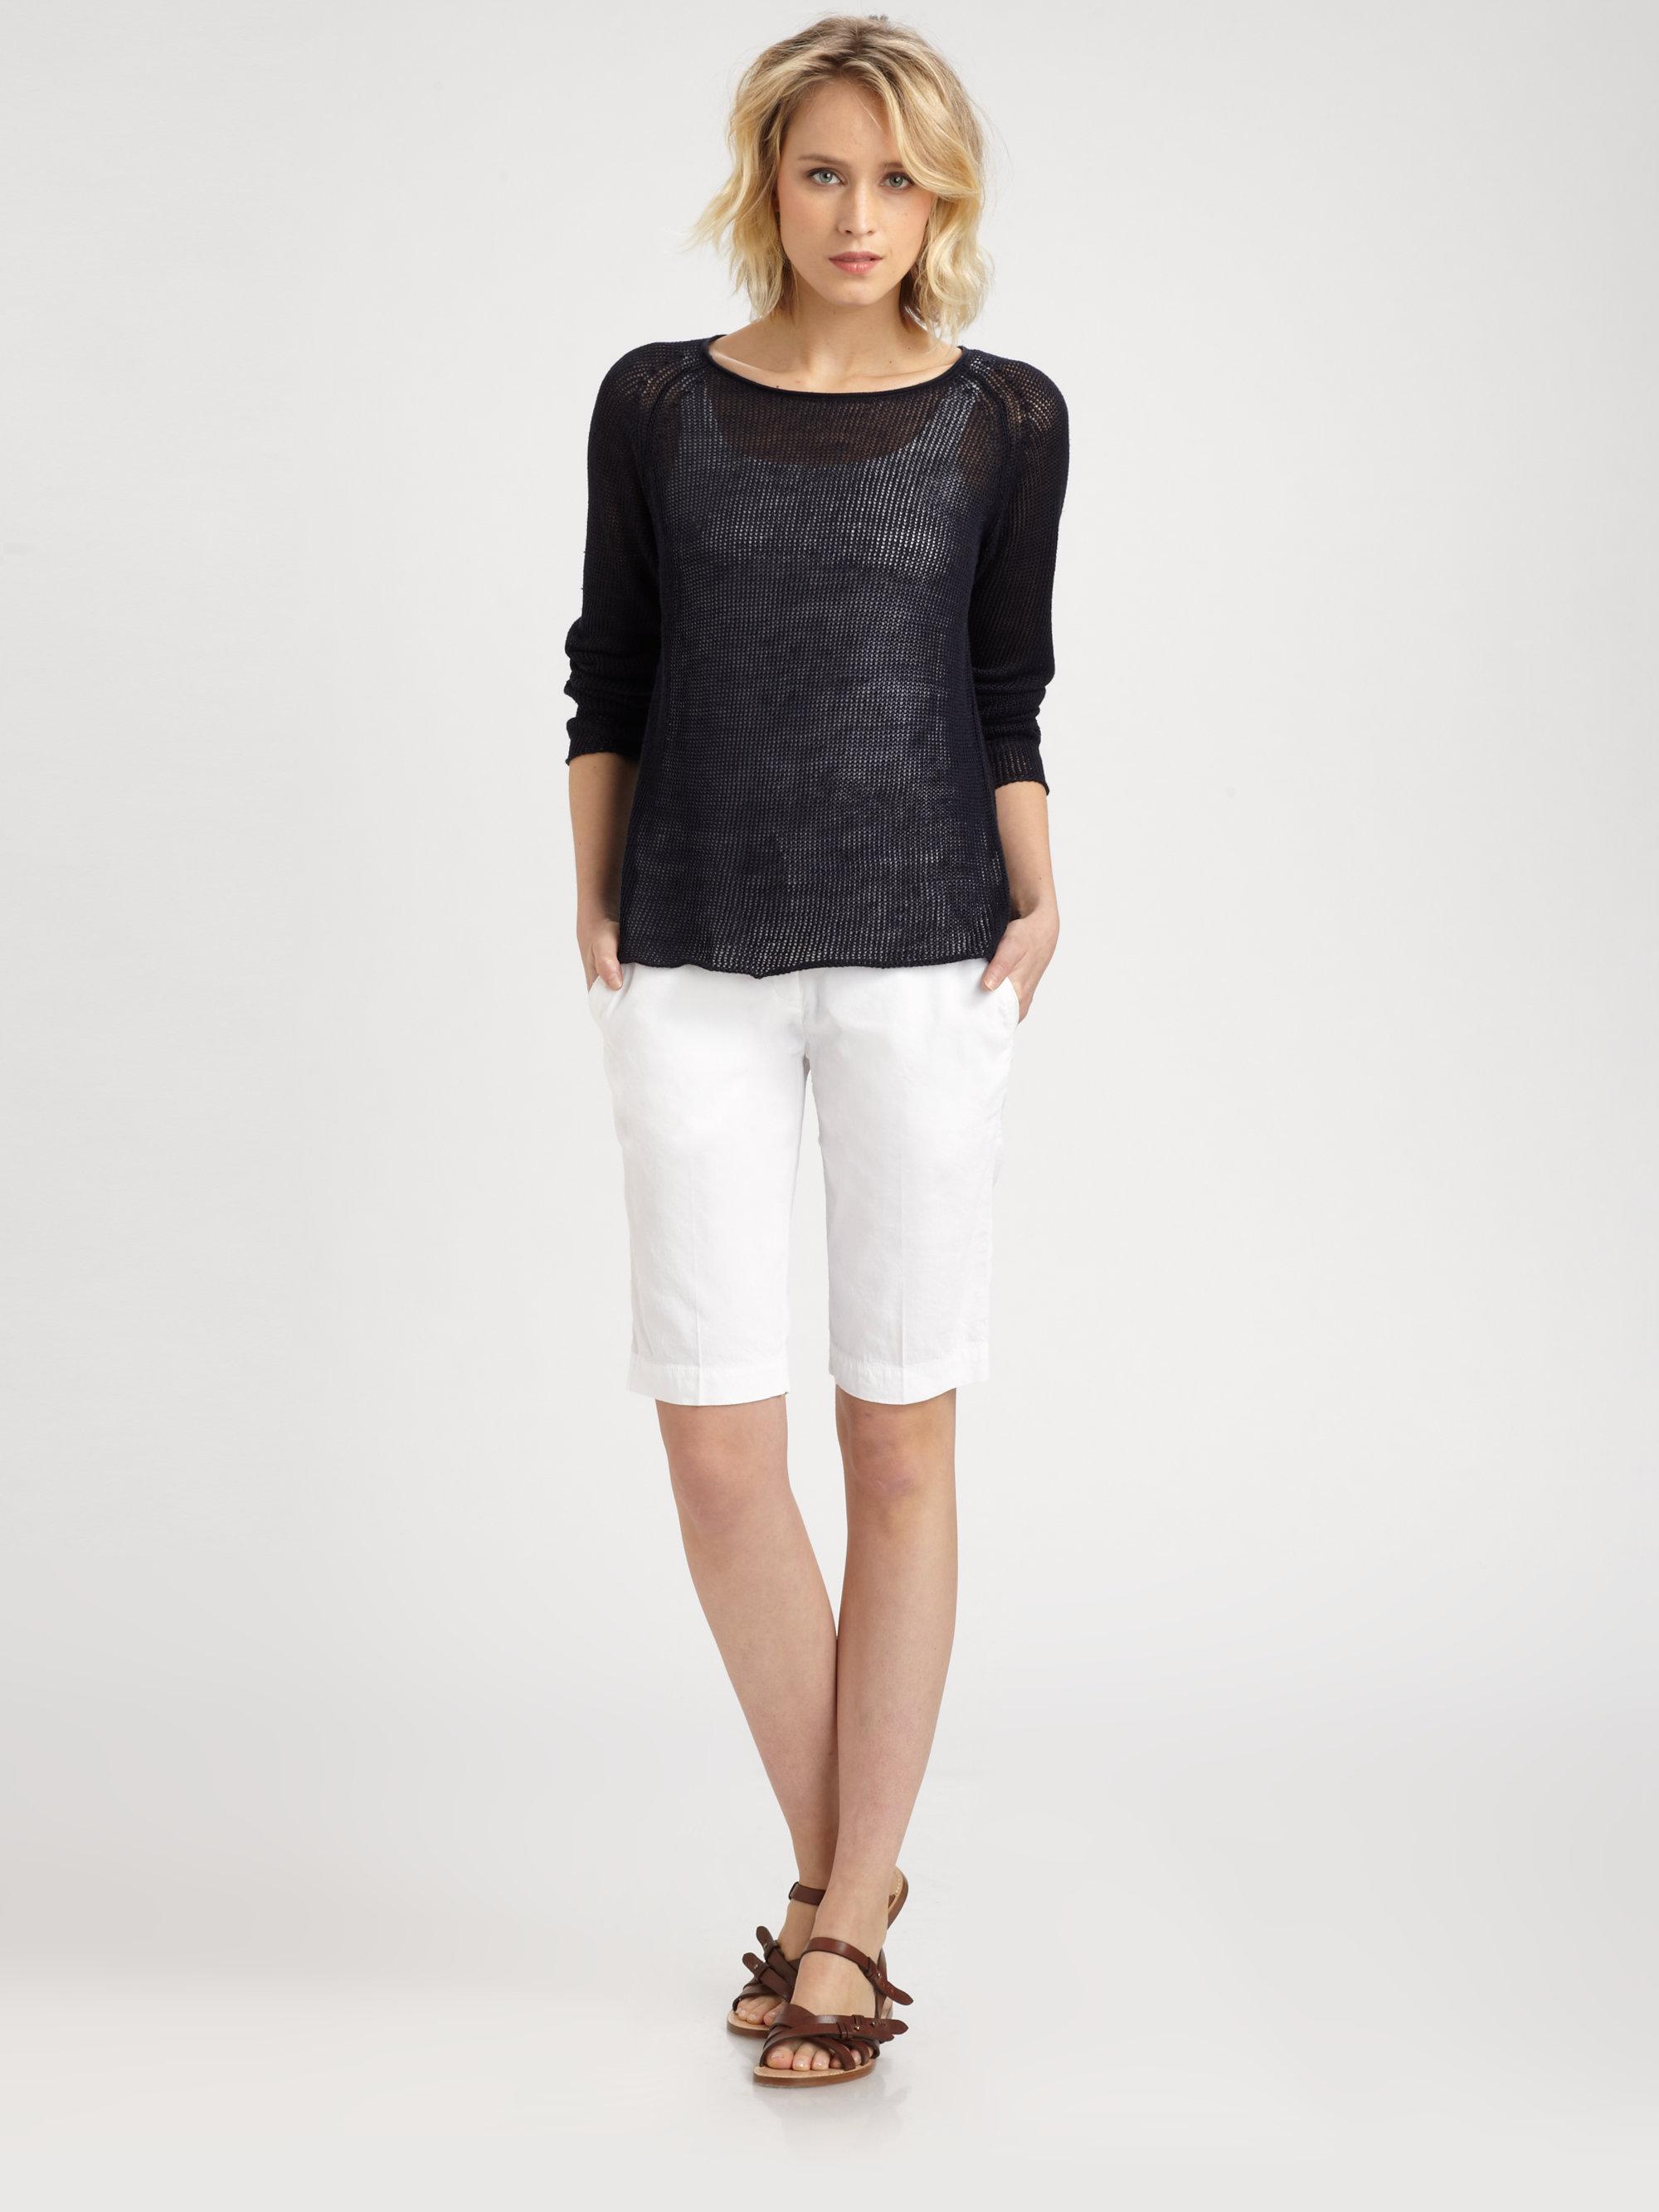 Eileen fisher Walking Shorts in White | Lyst